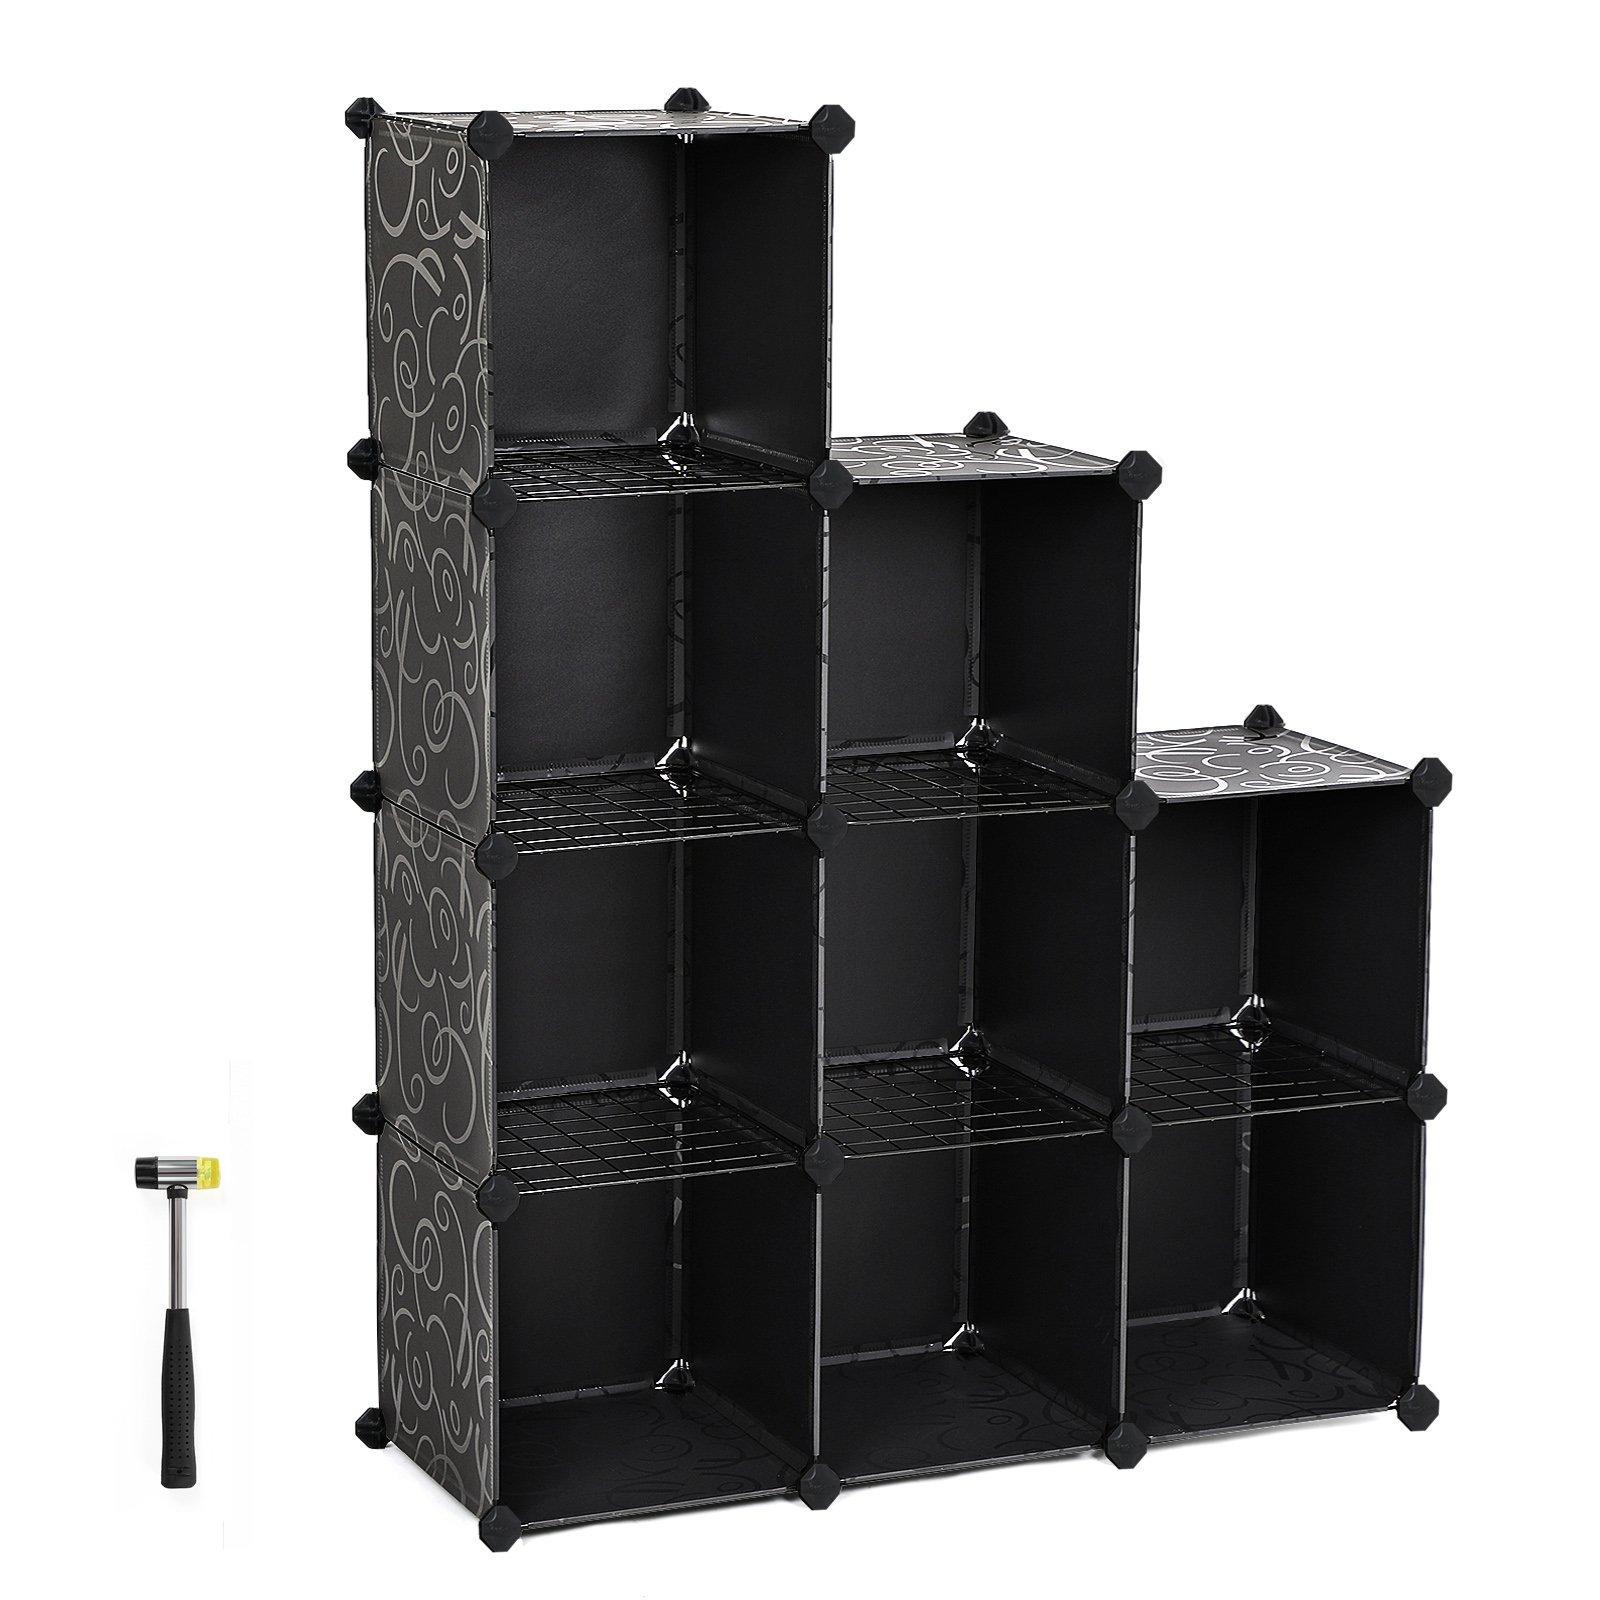 SONGMICS Cube Storage, Plastic Cube Organizer Units Shelf, DIY Modular Closet Cabinet, Bookcase, Includes Rubber Mallet and Anti-Tipping Device 9-Cube Black ULPC33T